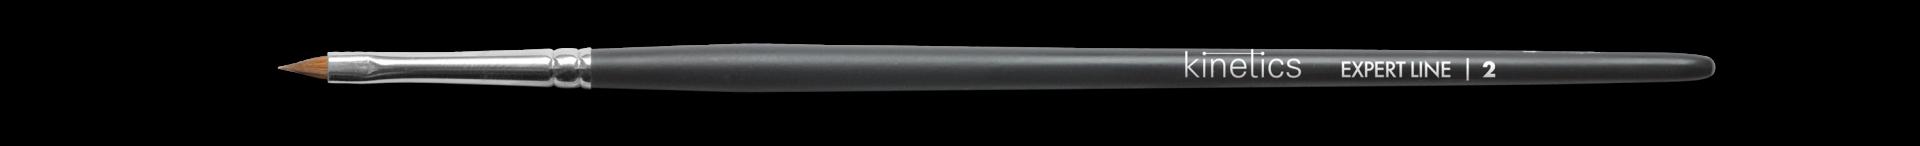 Kinetics Expert Line Universal Brush Size 2